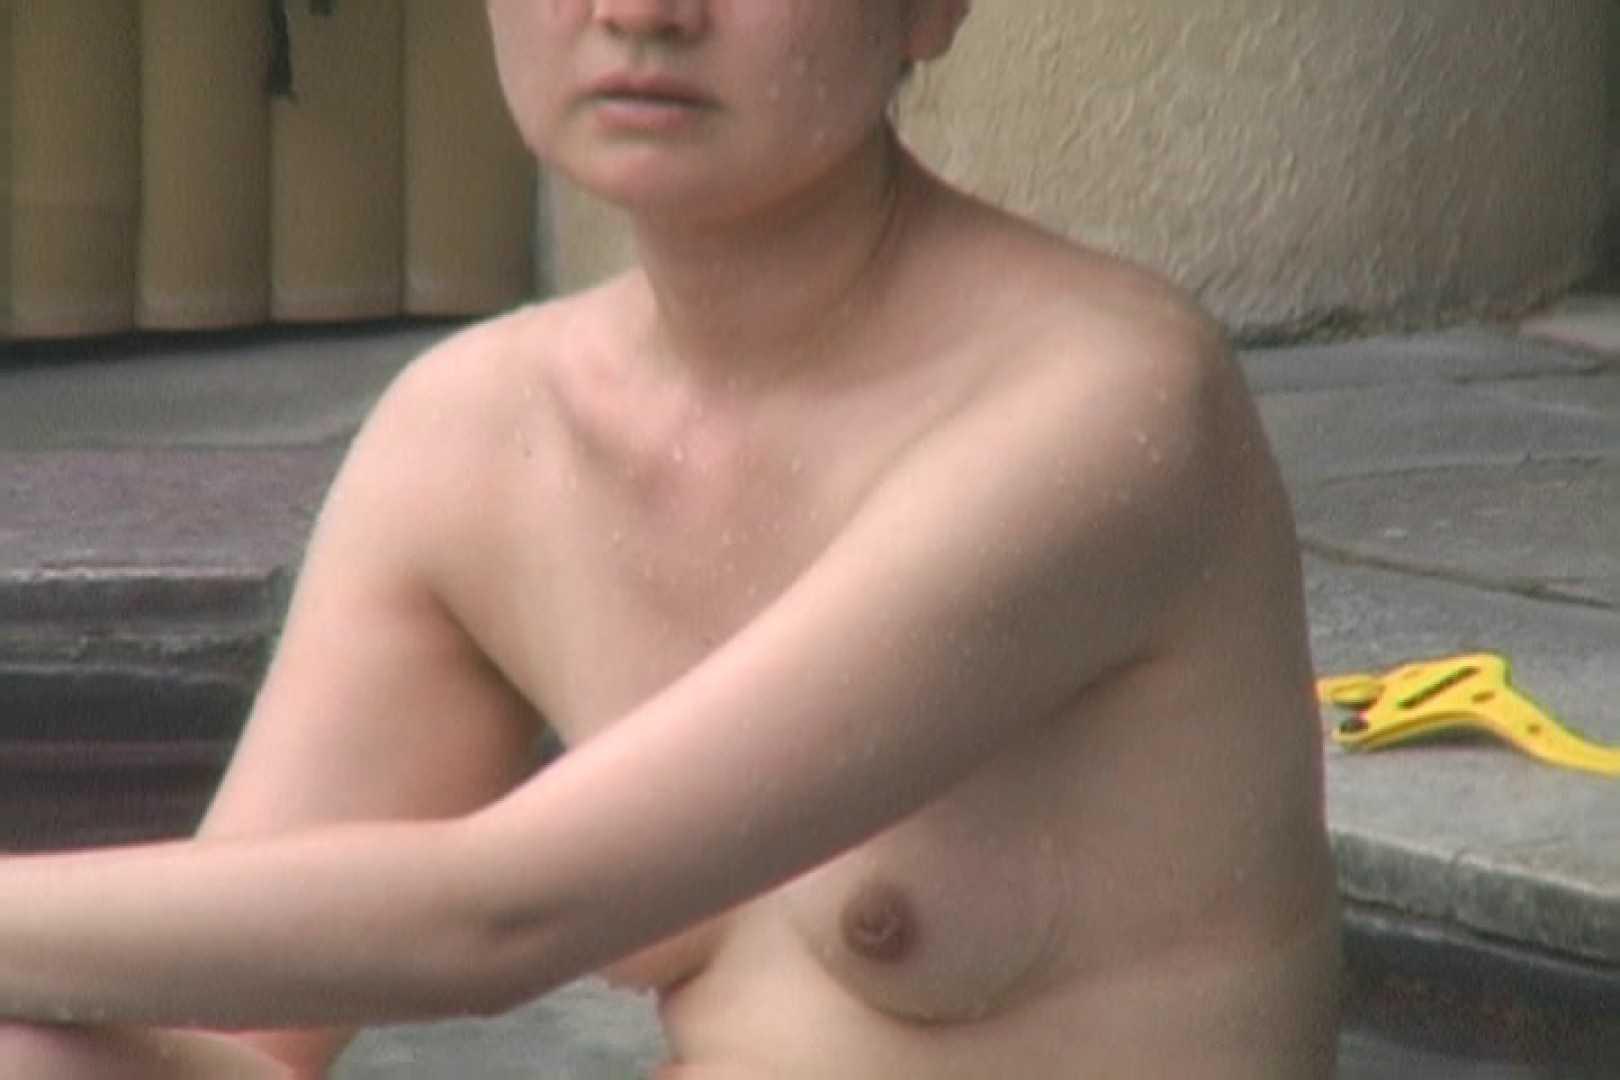 Aquaな露天風呂Vol.640 盗撮 濡れ場動画紹介 75画像 59